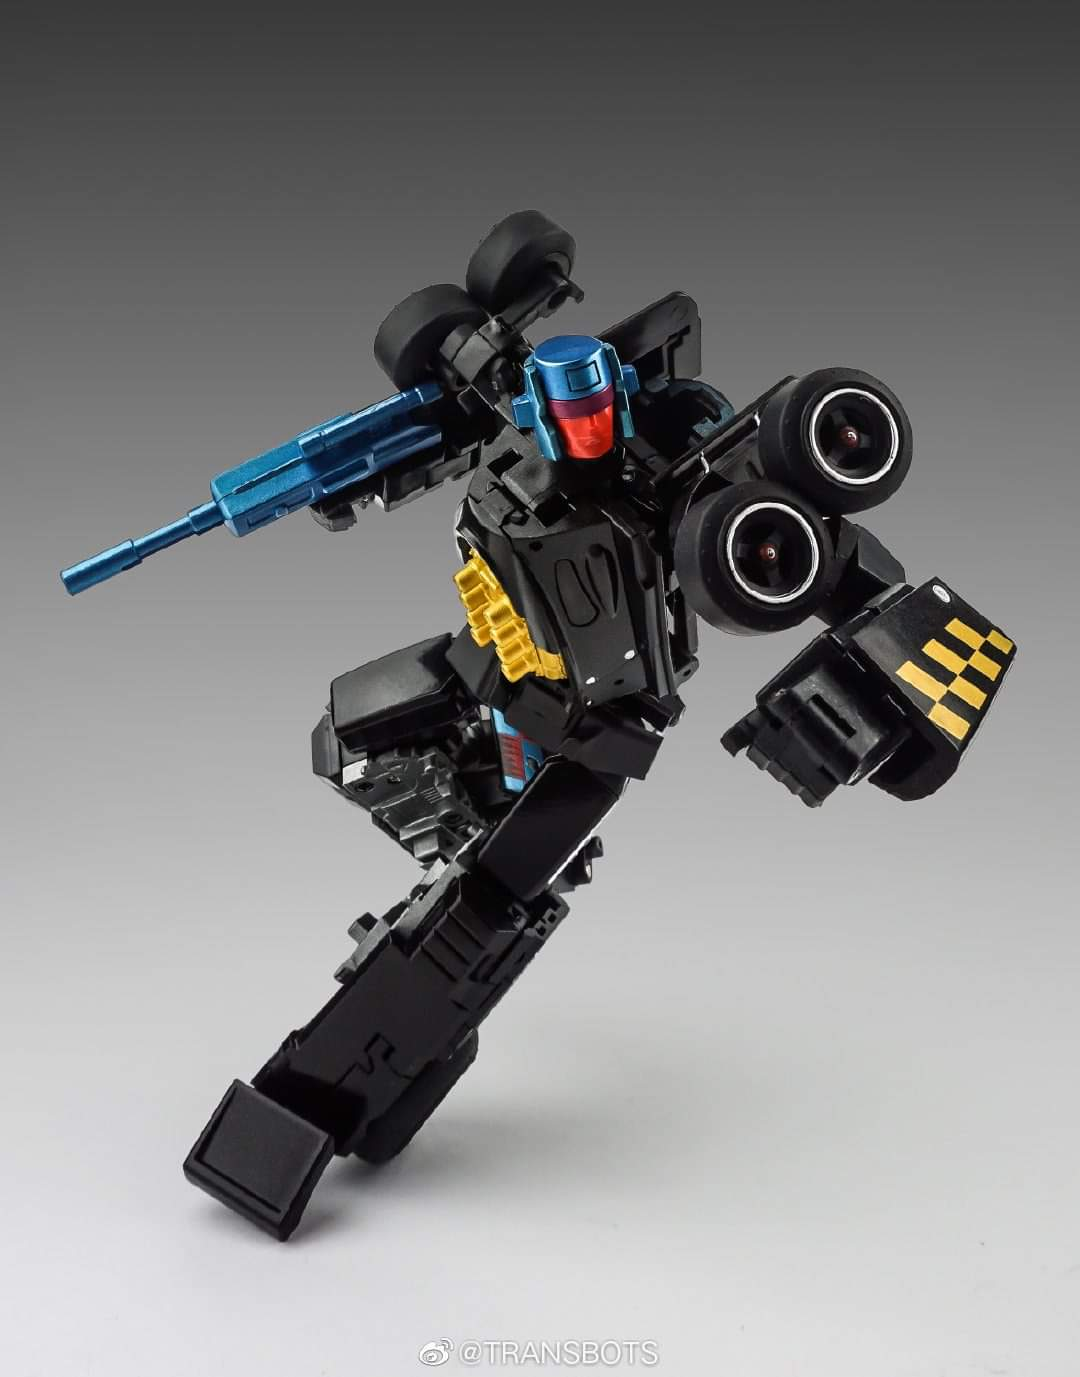 [X-Transbots] Produit Tiers - Jouets Berserkars forme Monolith (MX-XIII à MX-VII) - aka Stunticons forme Menasor/Menaseur - Page 6 UvrvzaoT_o